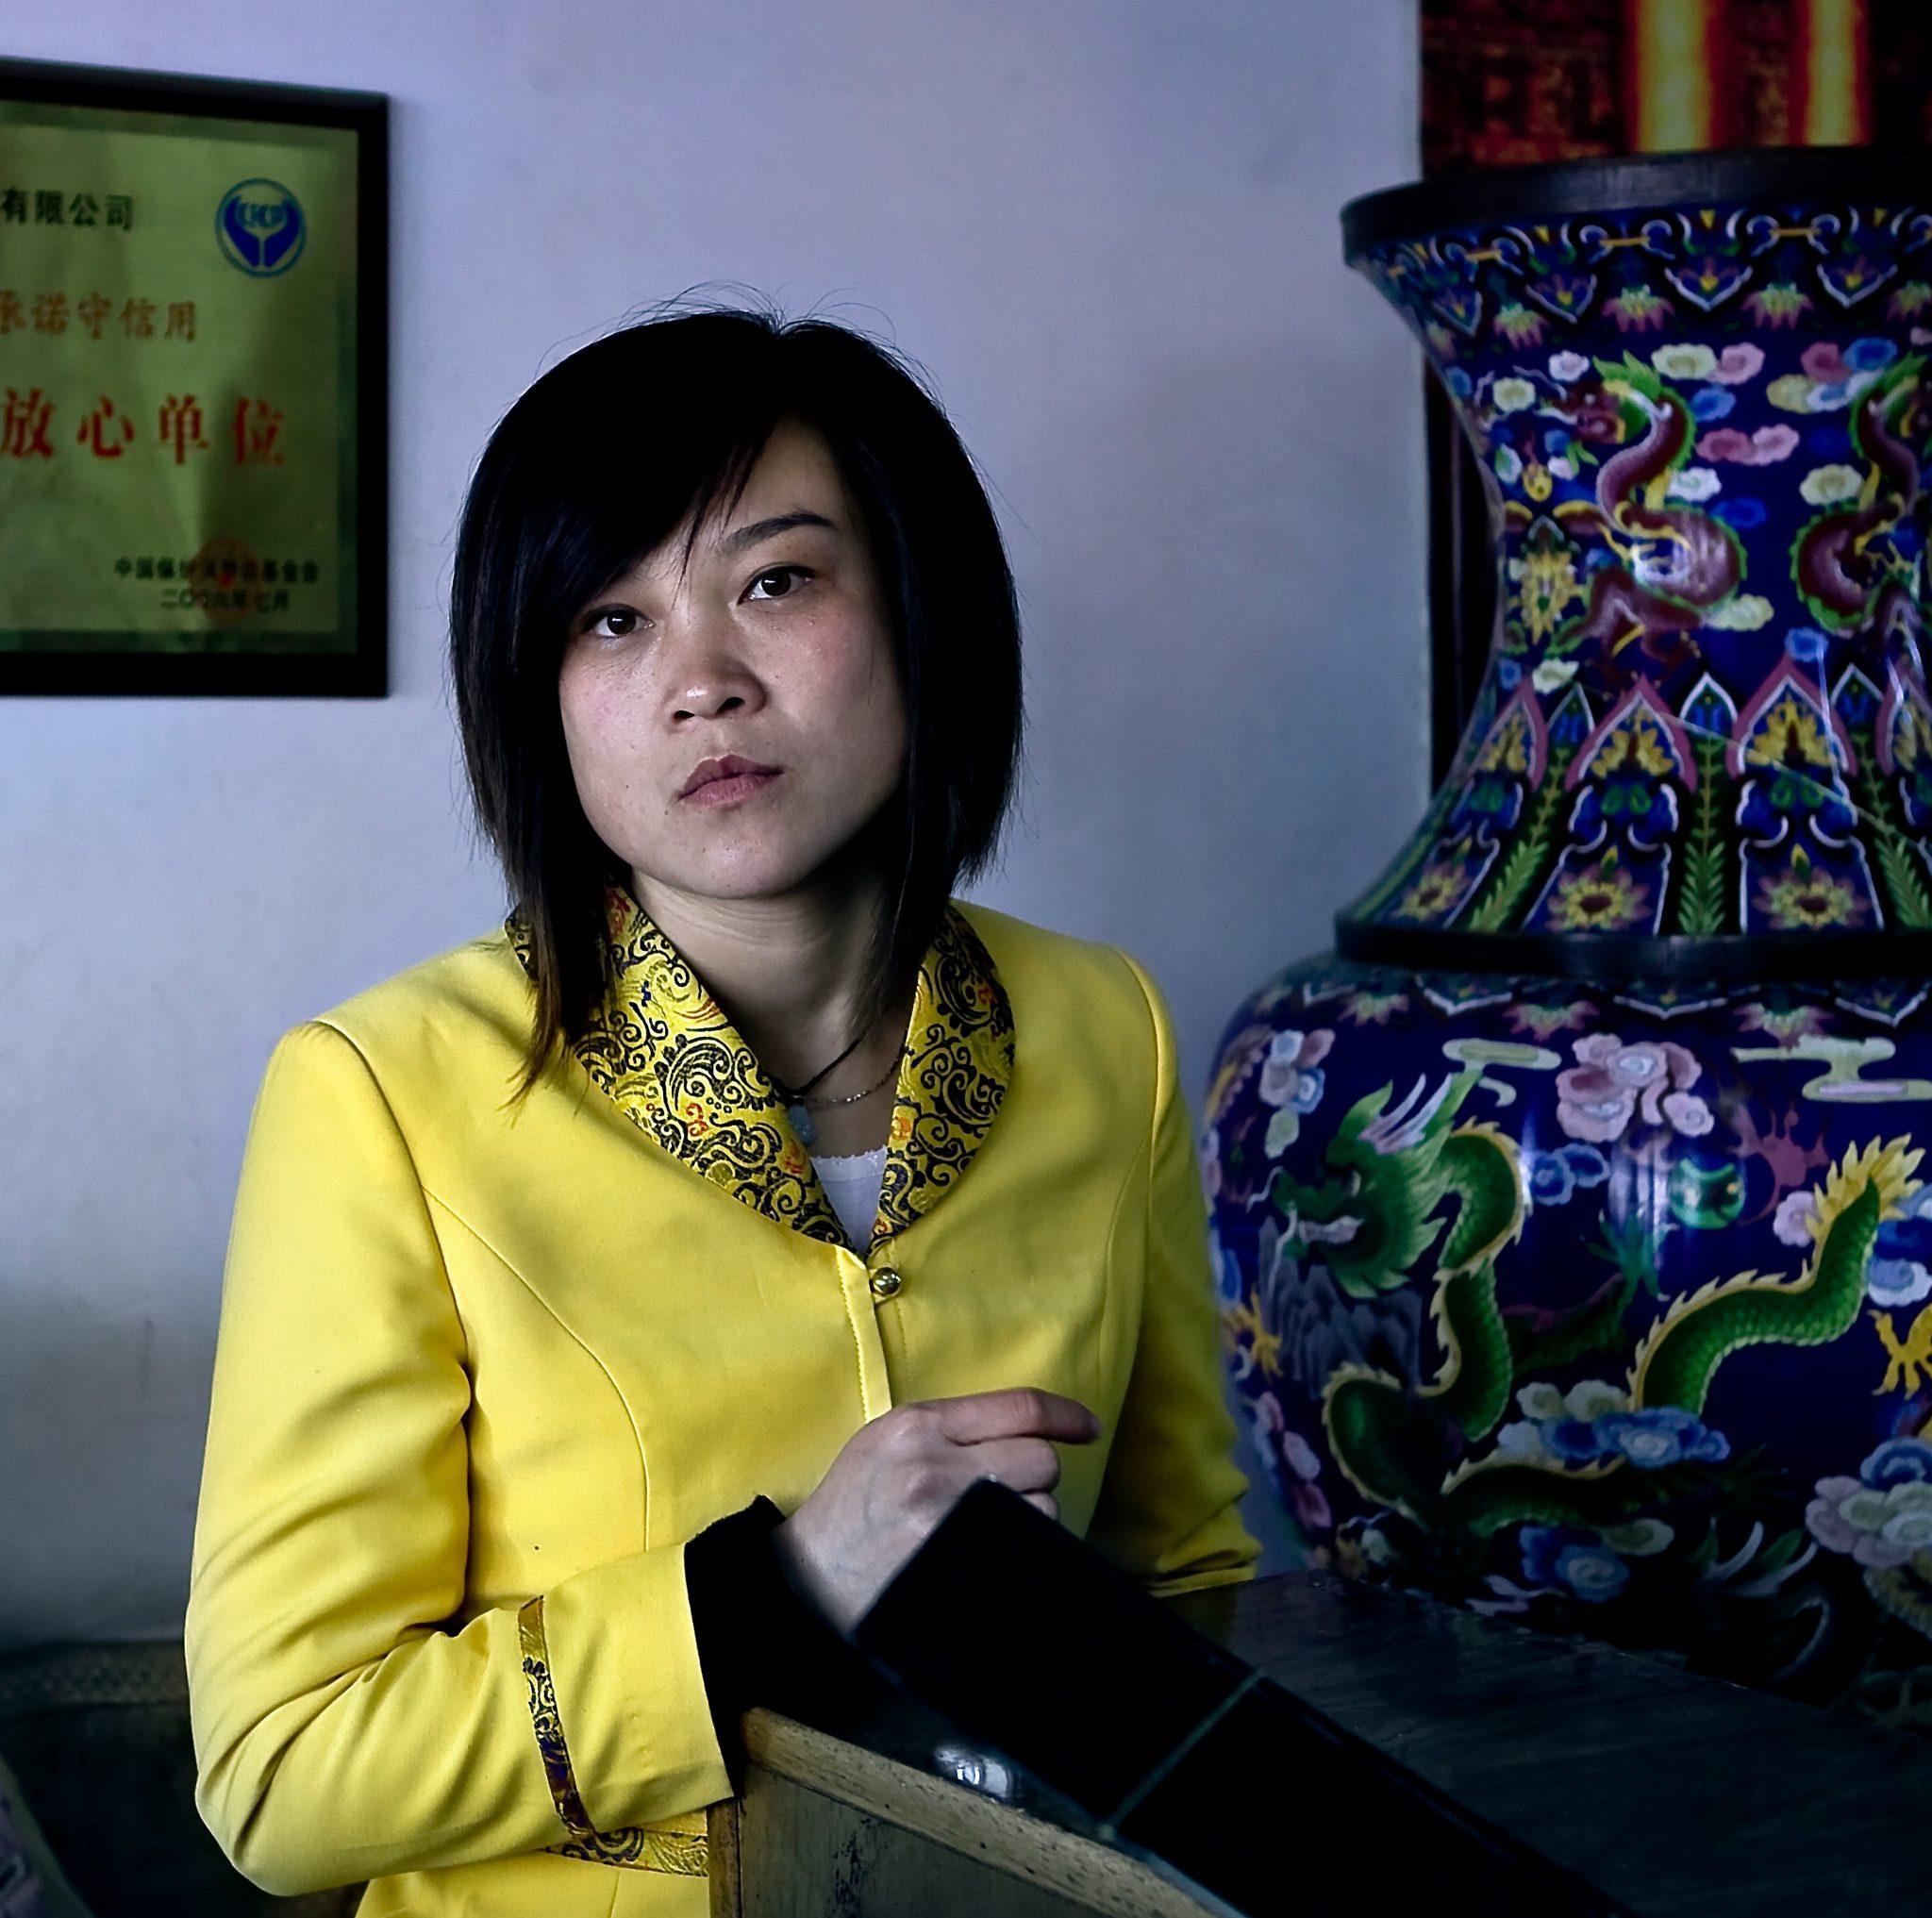 Xi Jinping Rejects Human Rights